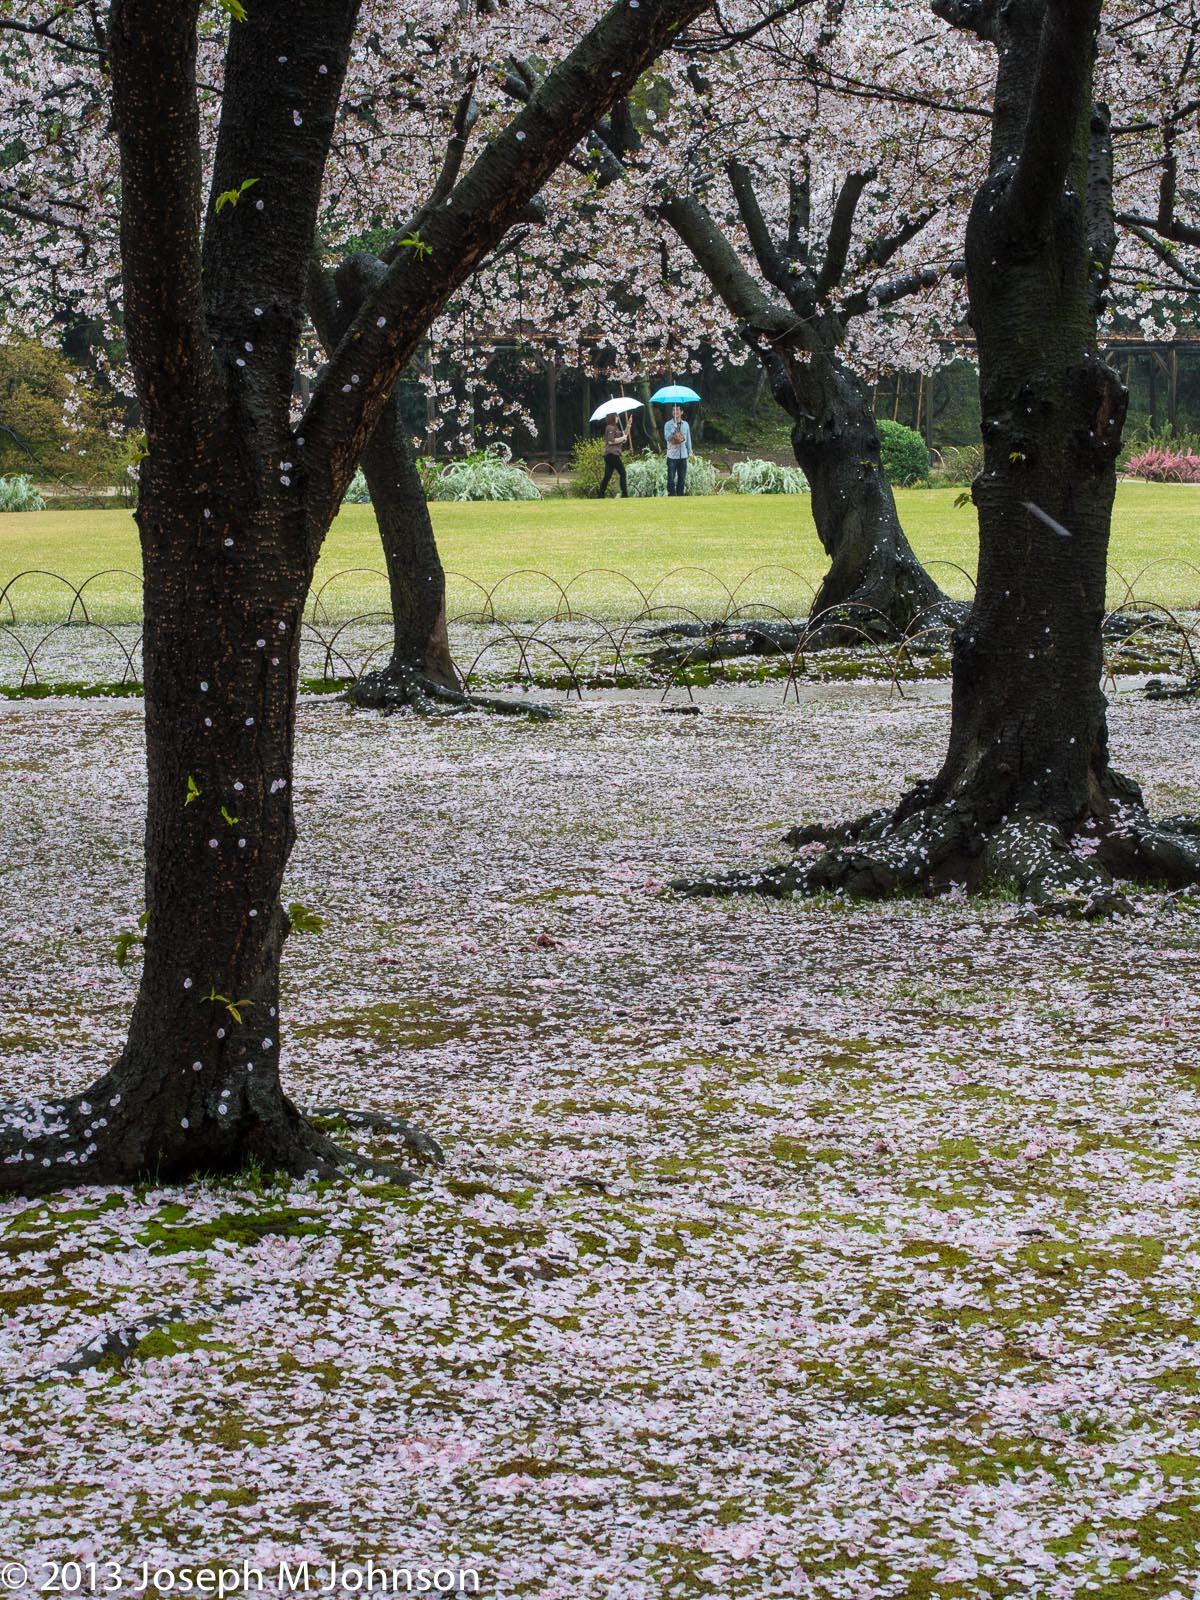 Okayama Korakuen garden: Sakura petals carpet the ground